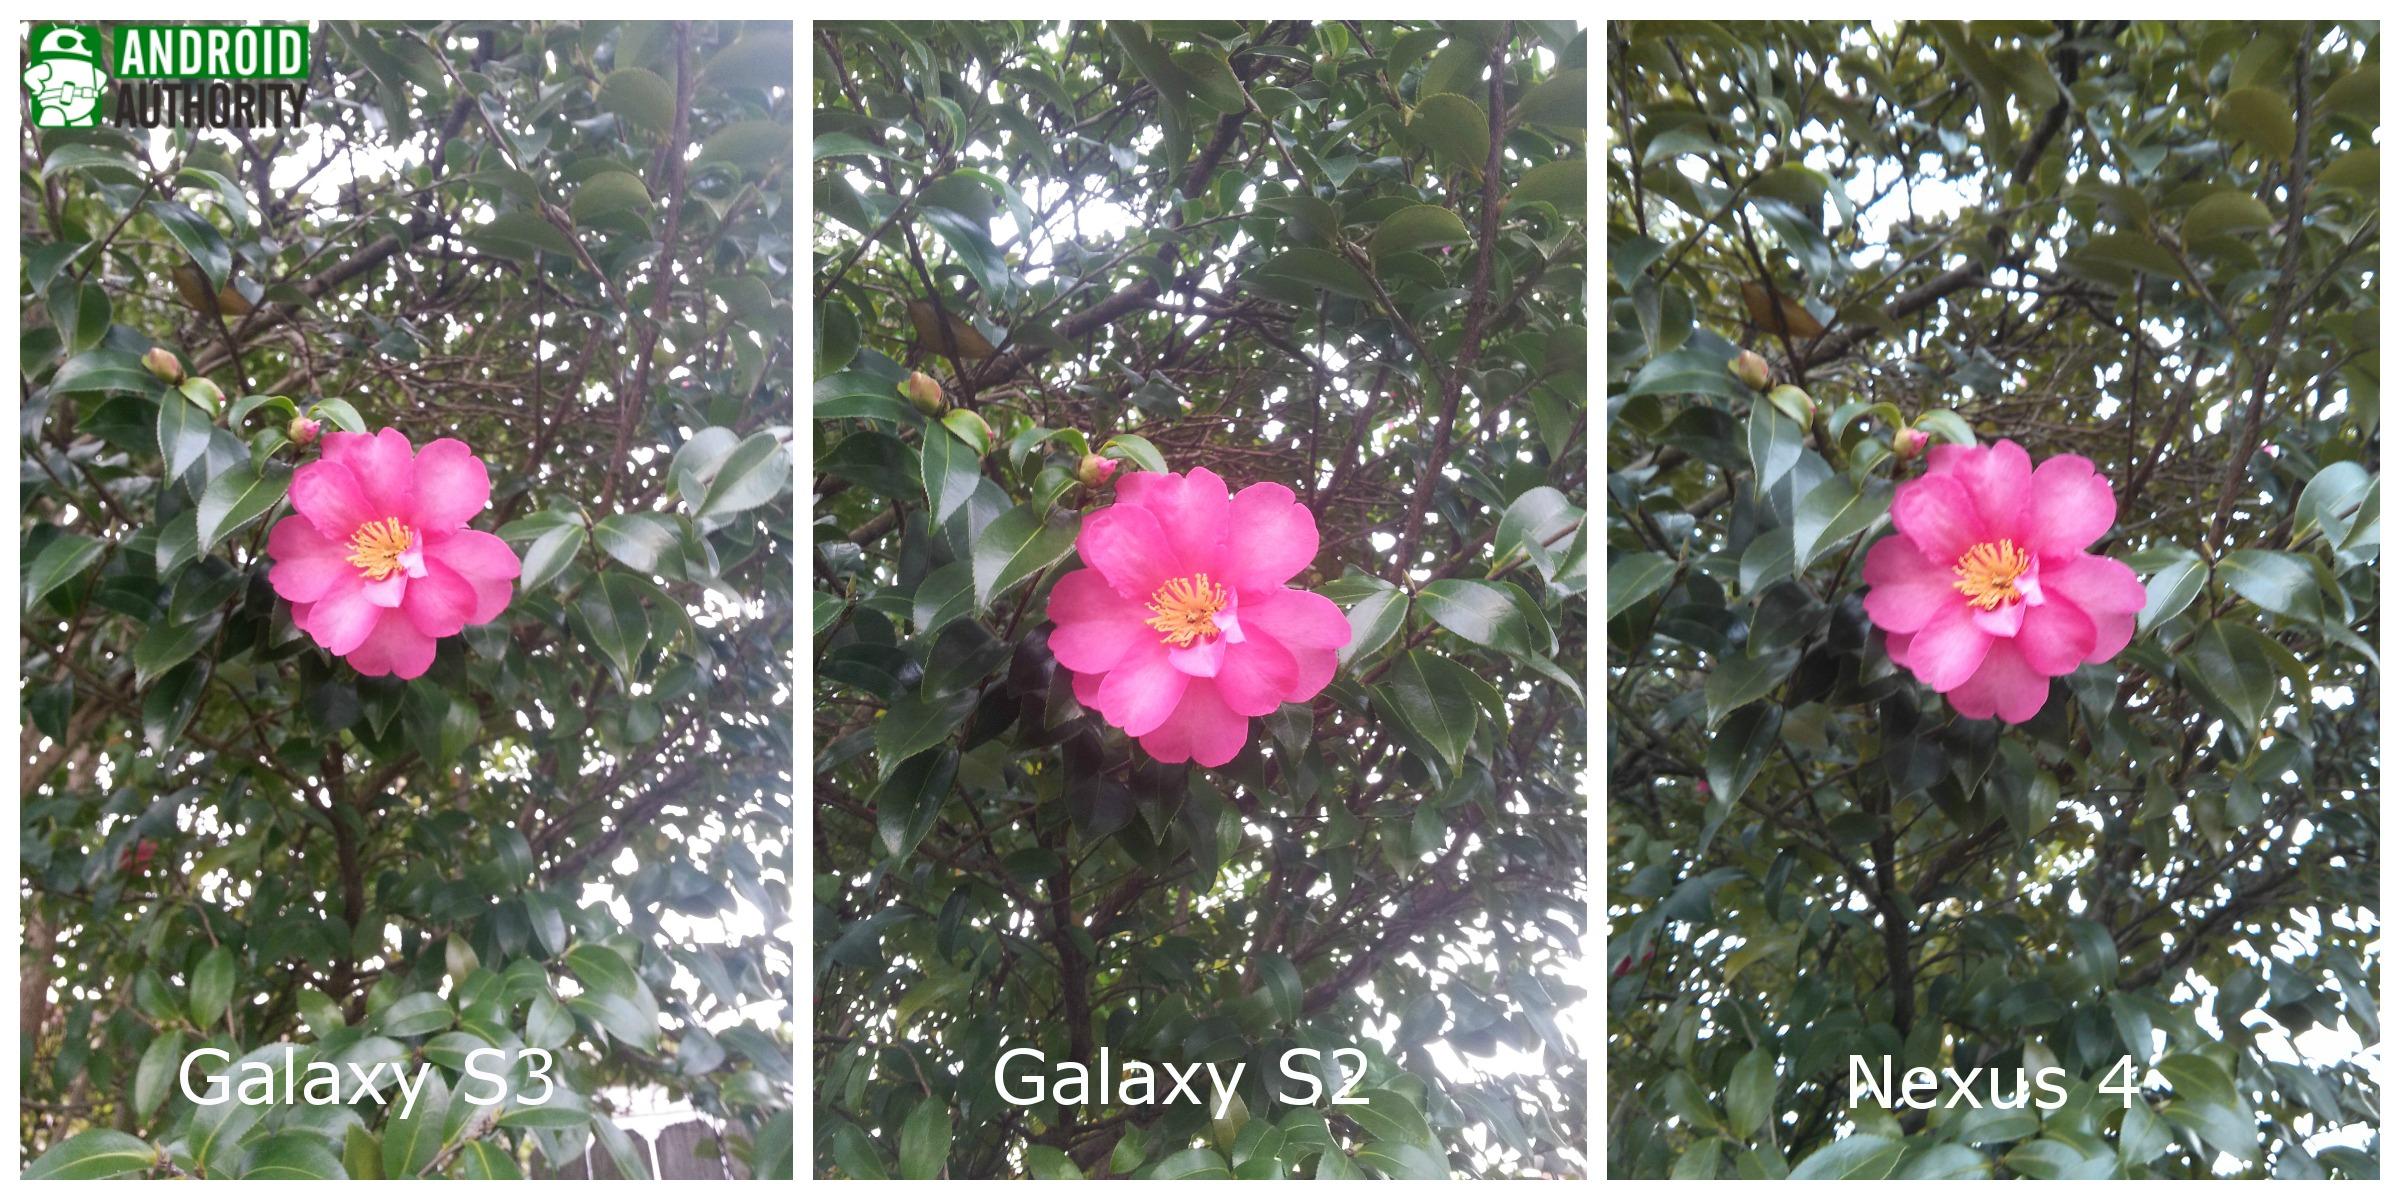 galaxy-s3-galaxy-s2-nexus 4-flower-aa